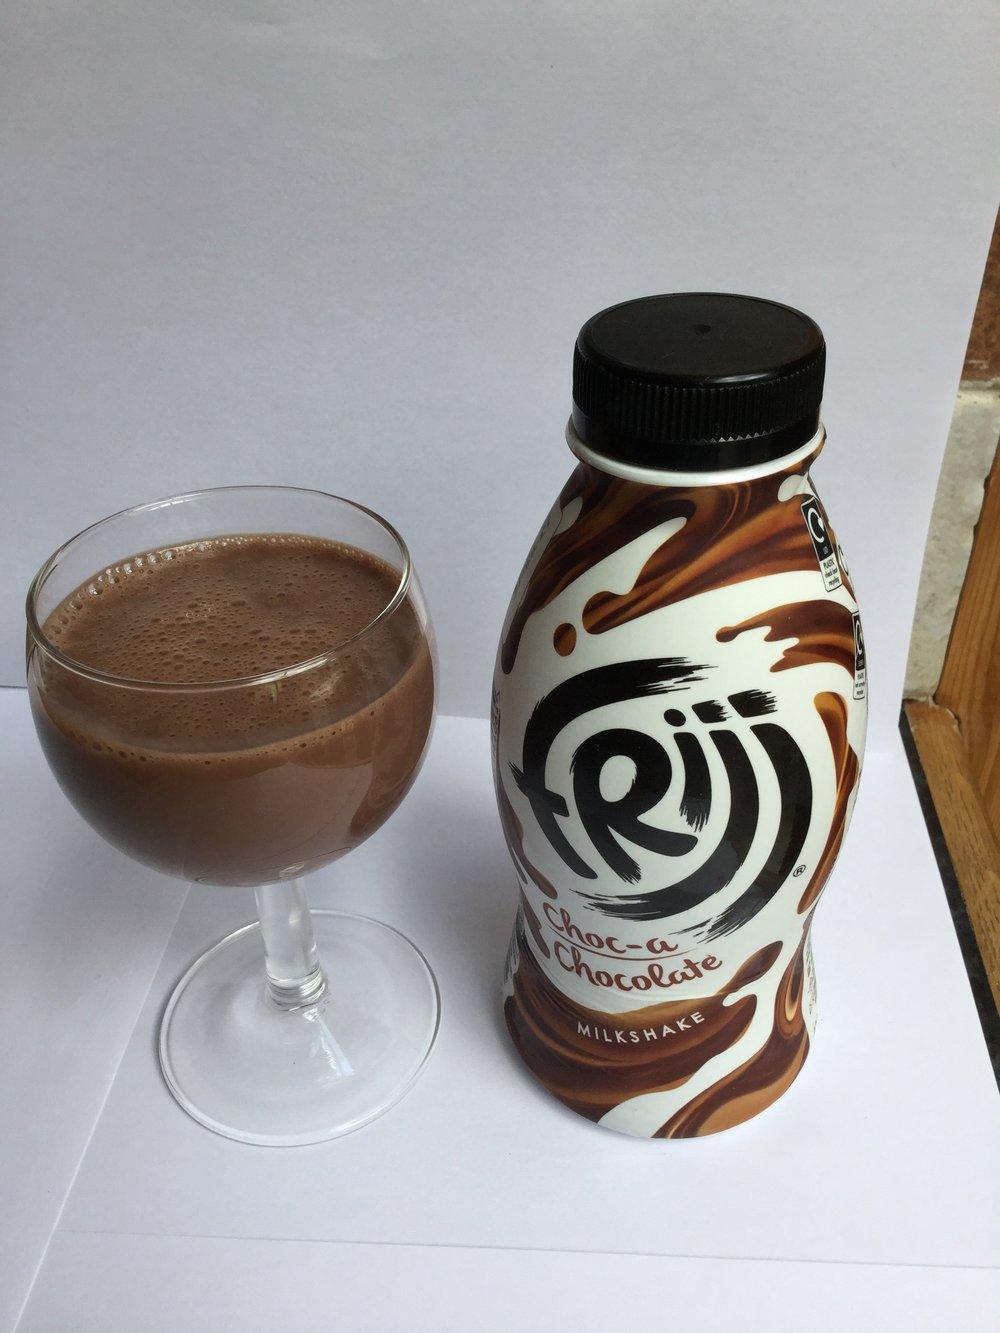 Frijj Choc-a Chocolate Milkshake Cup